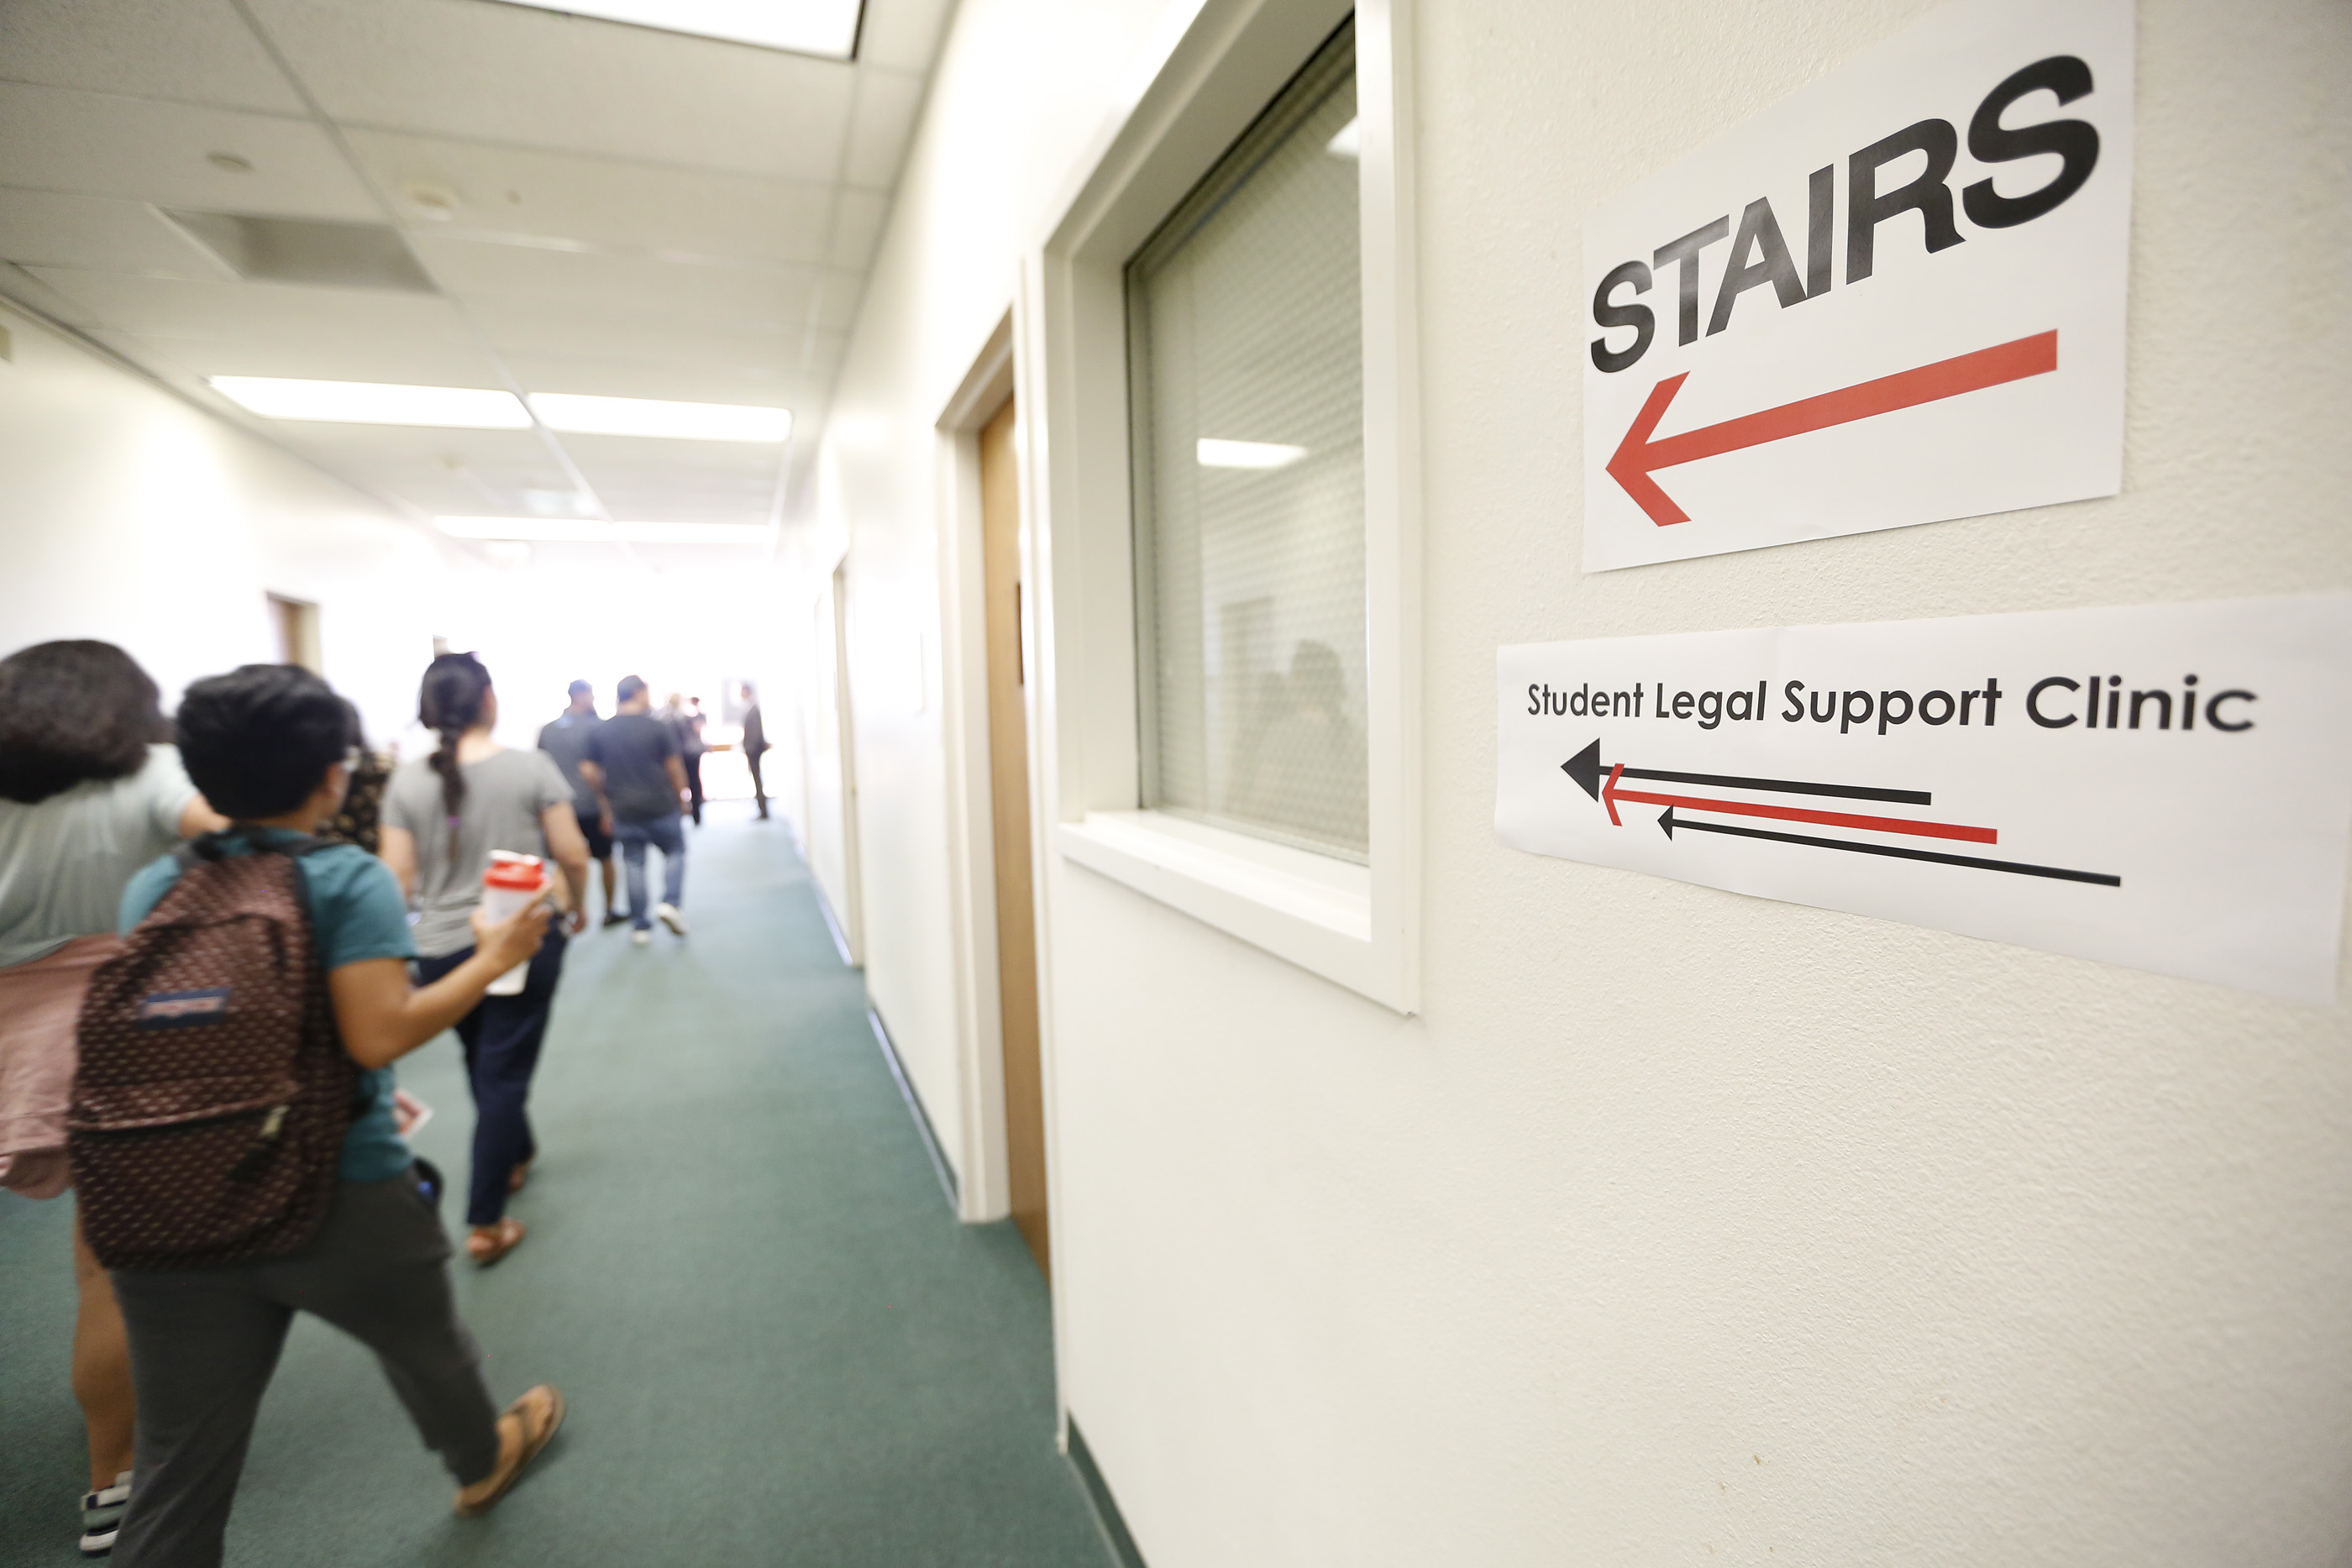 La clínica legal se ubica dentro de la biblioteca Oviatt en CSUN. (Aurelia Ventura/La Opinion)